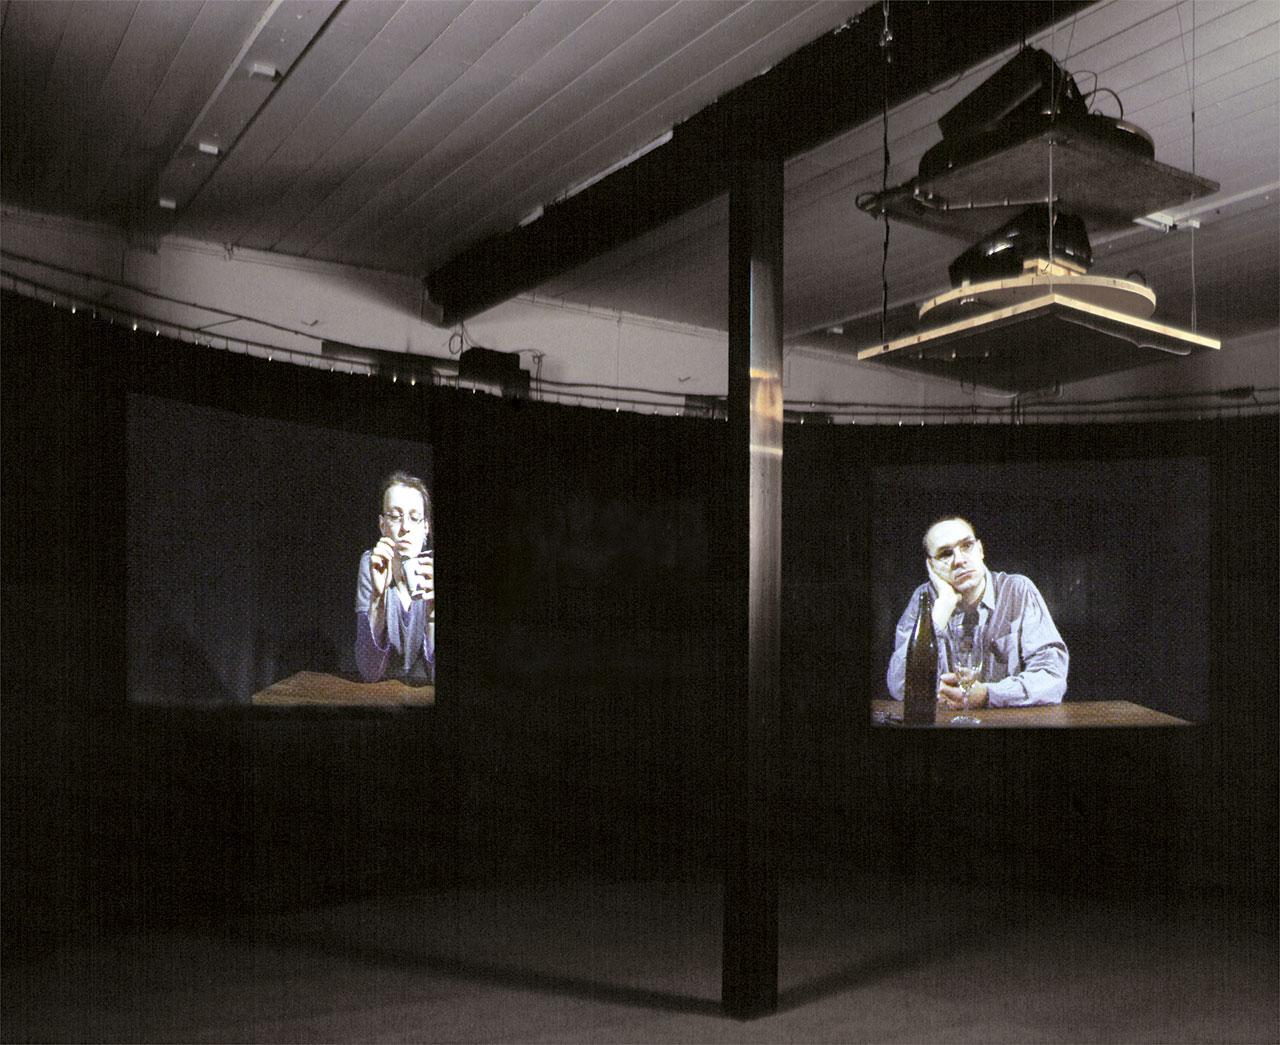 Kreislauf 2, 2000, Rotating dual channel installation